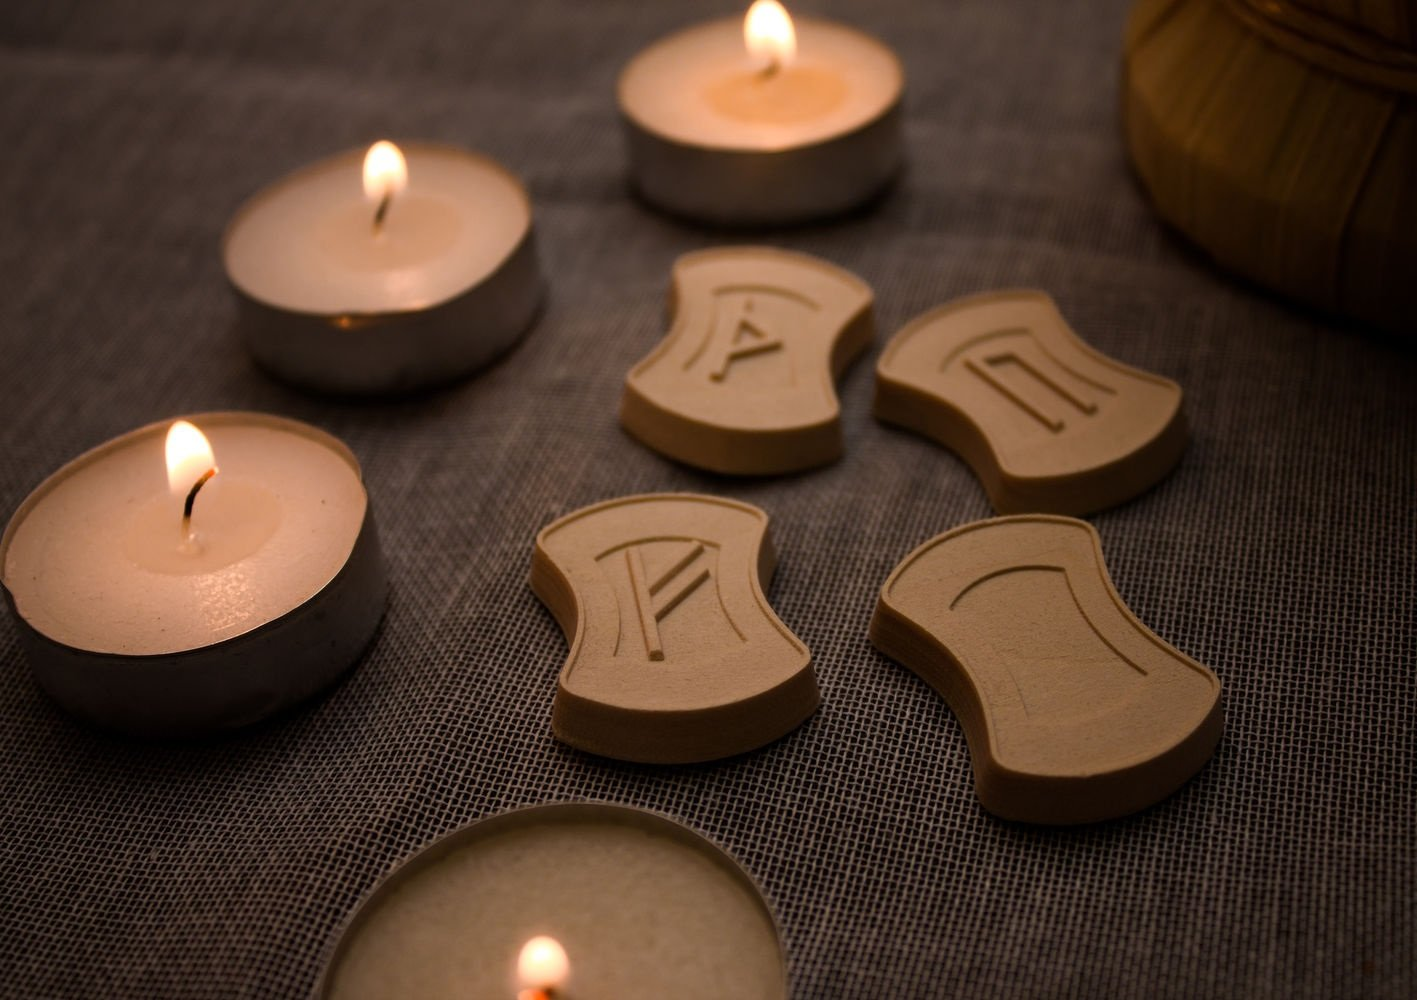 Приворот с рунами и свечой